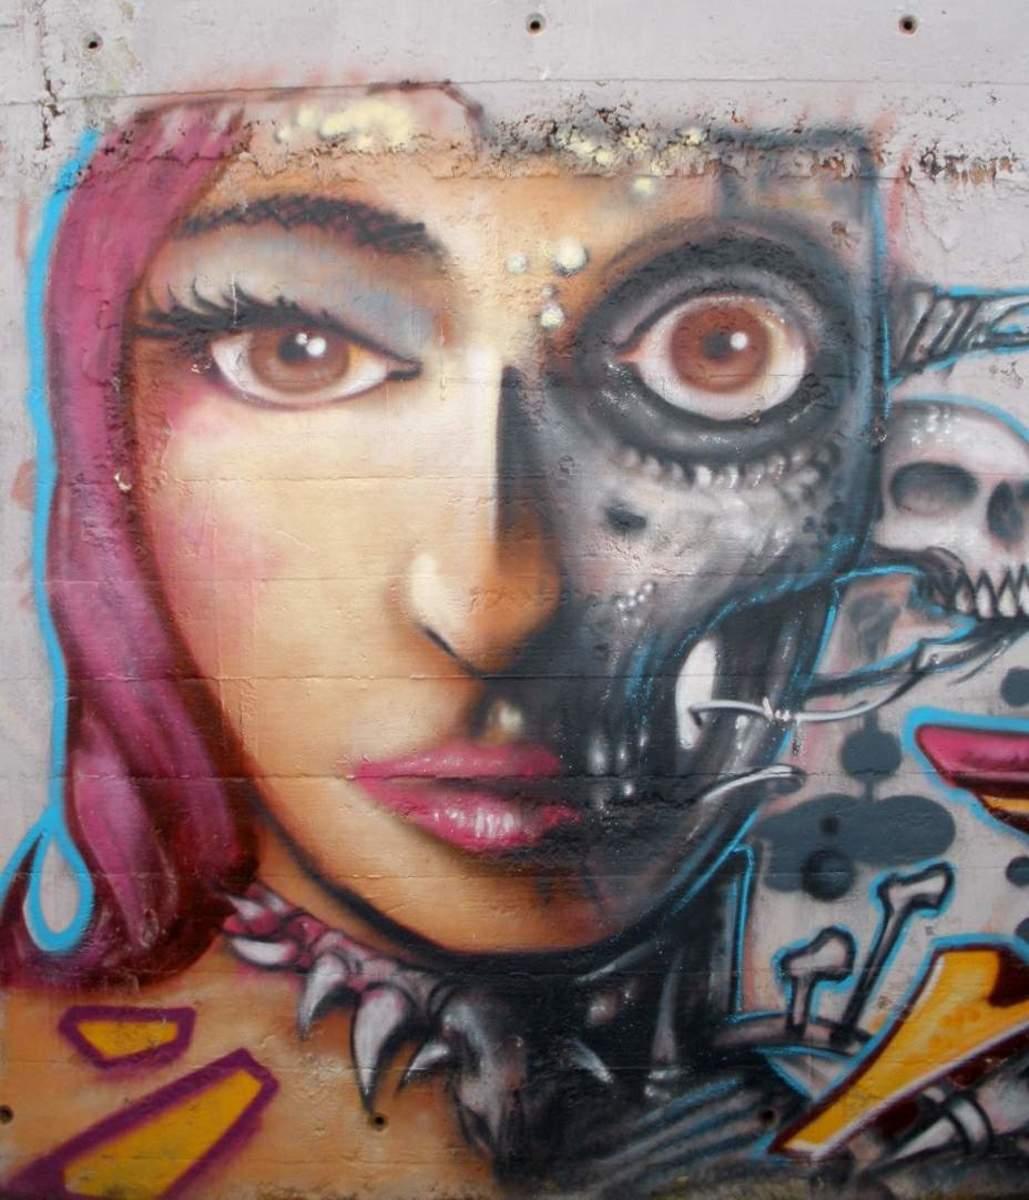 graffiti mural by artist Zarateman.